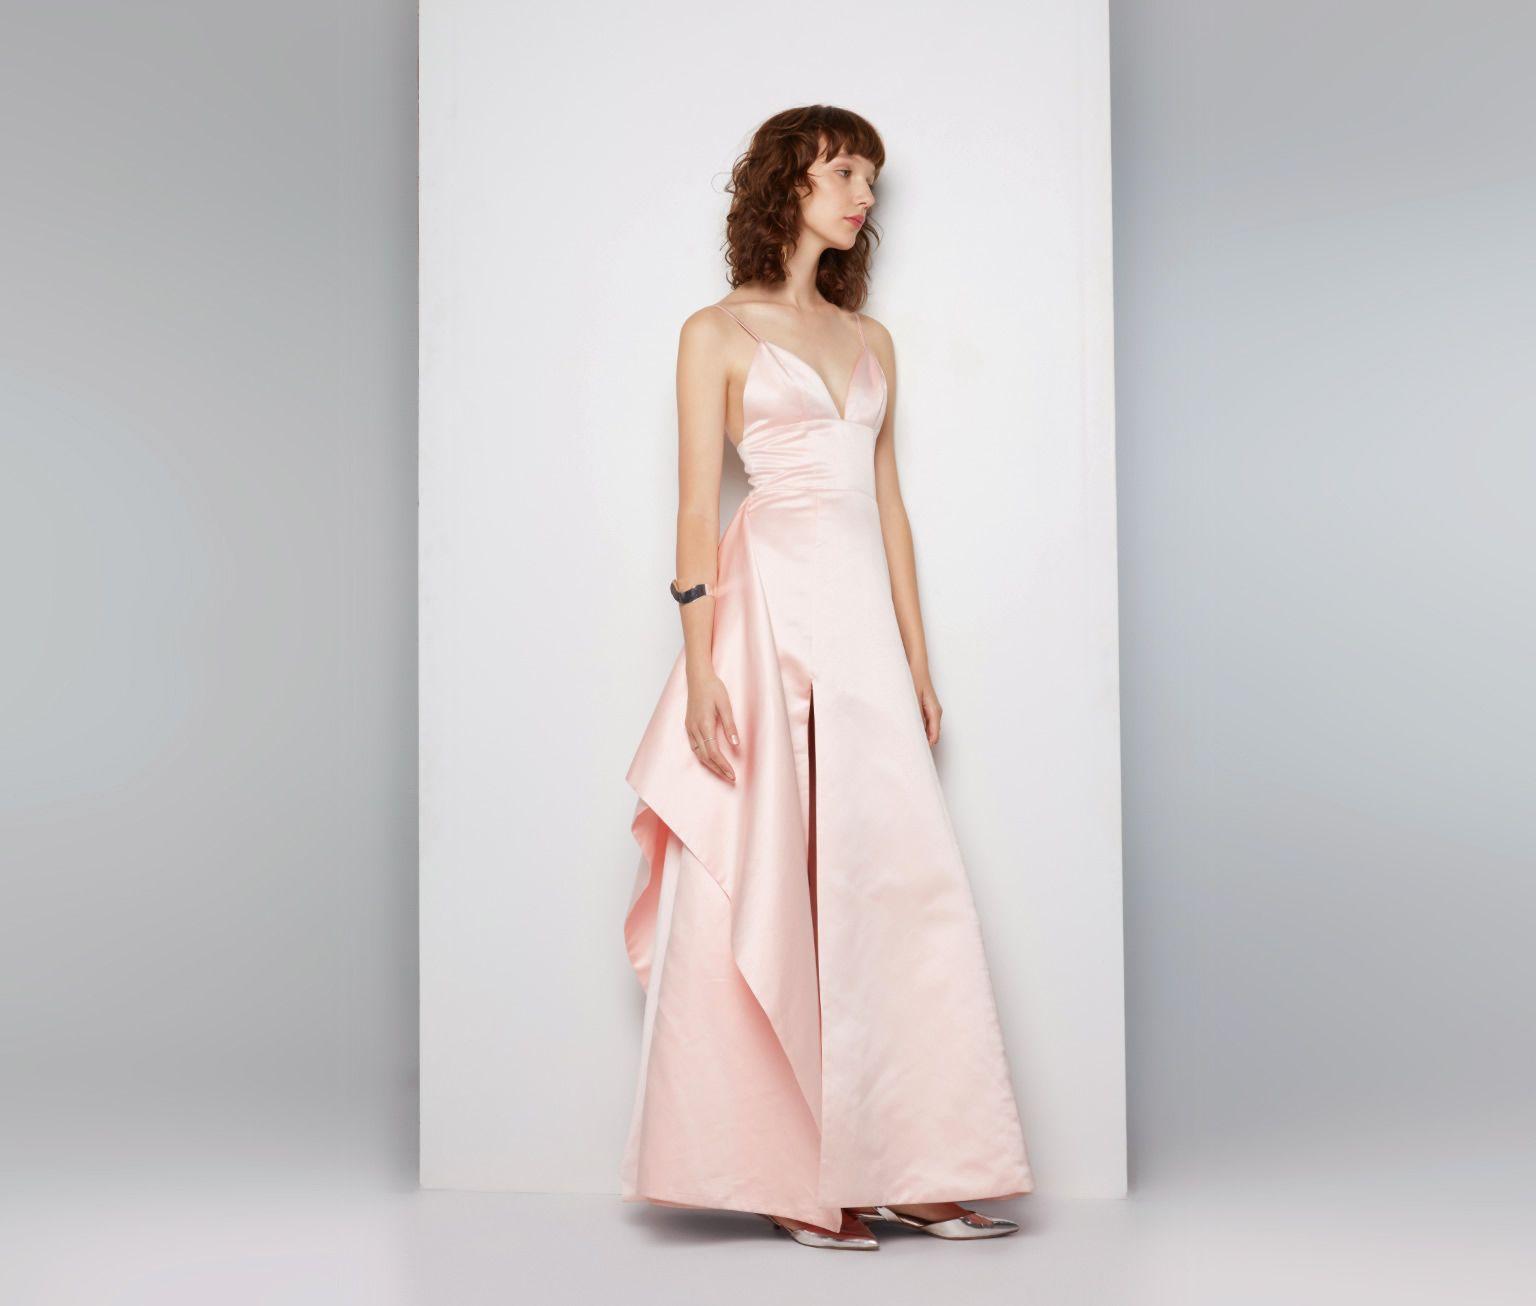 951d5974e3 Fame & Partners Santina Dress | Clothes | Dresses, Satin dresses ...